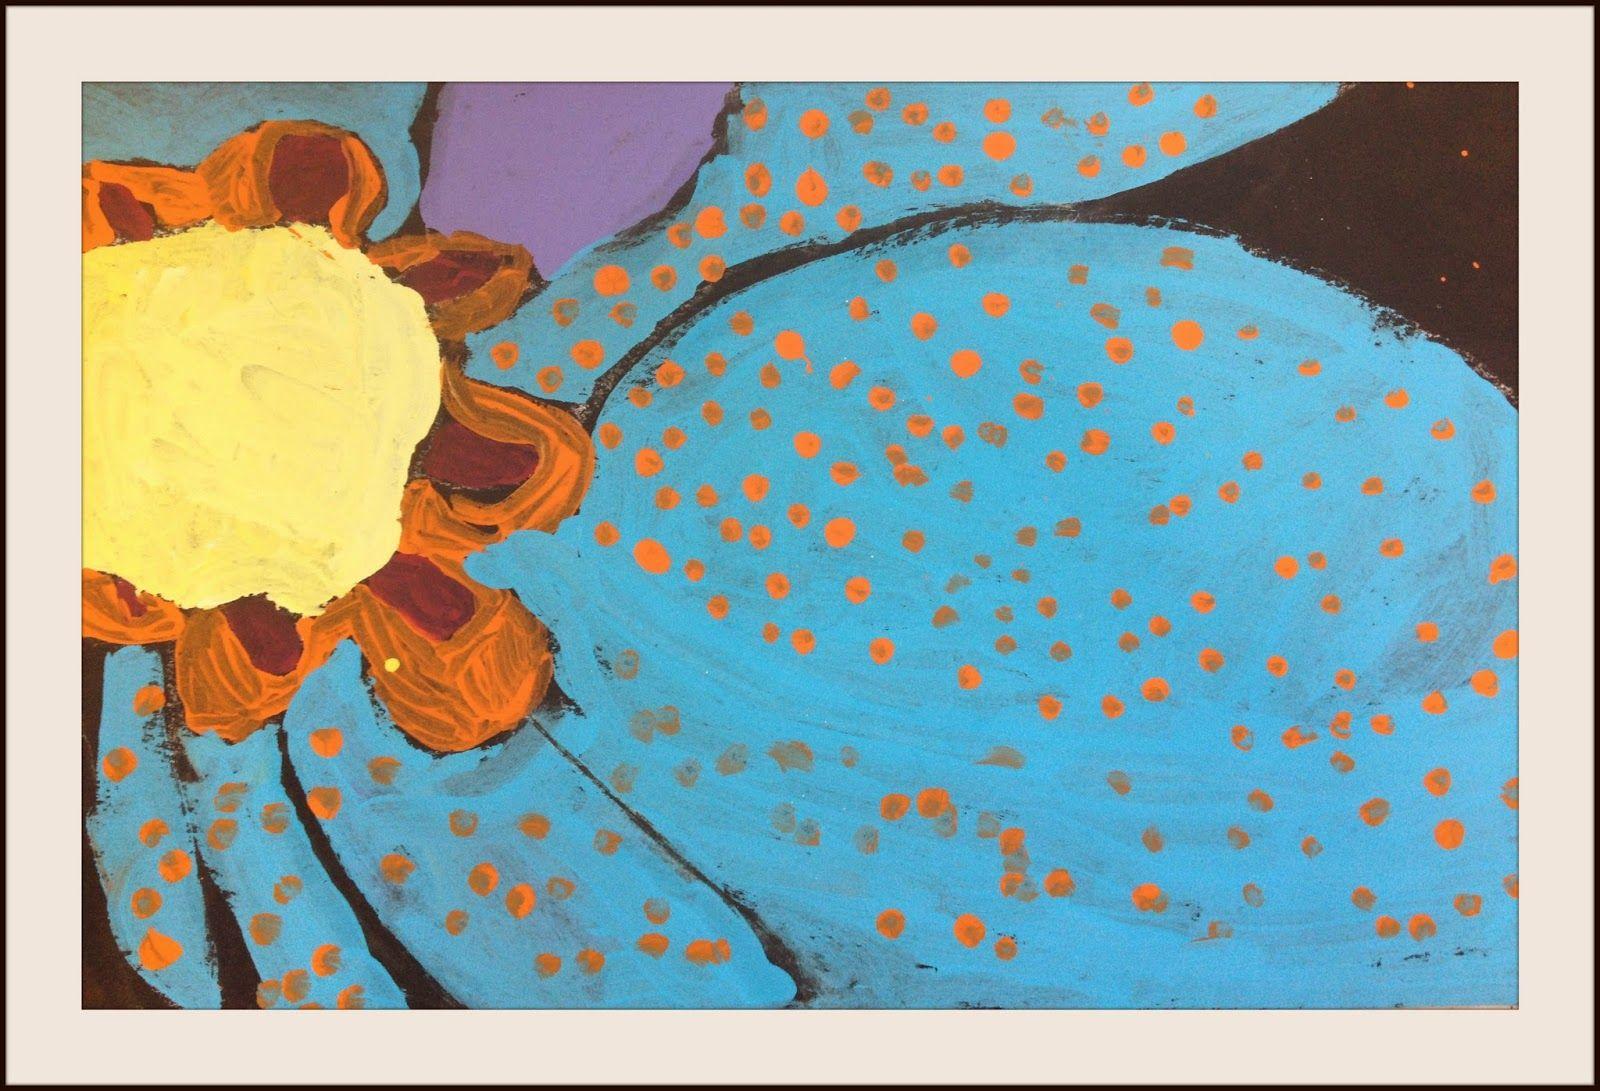 Marymaking Georgia O Keeffe Flowers With Roofing Felt